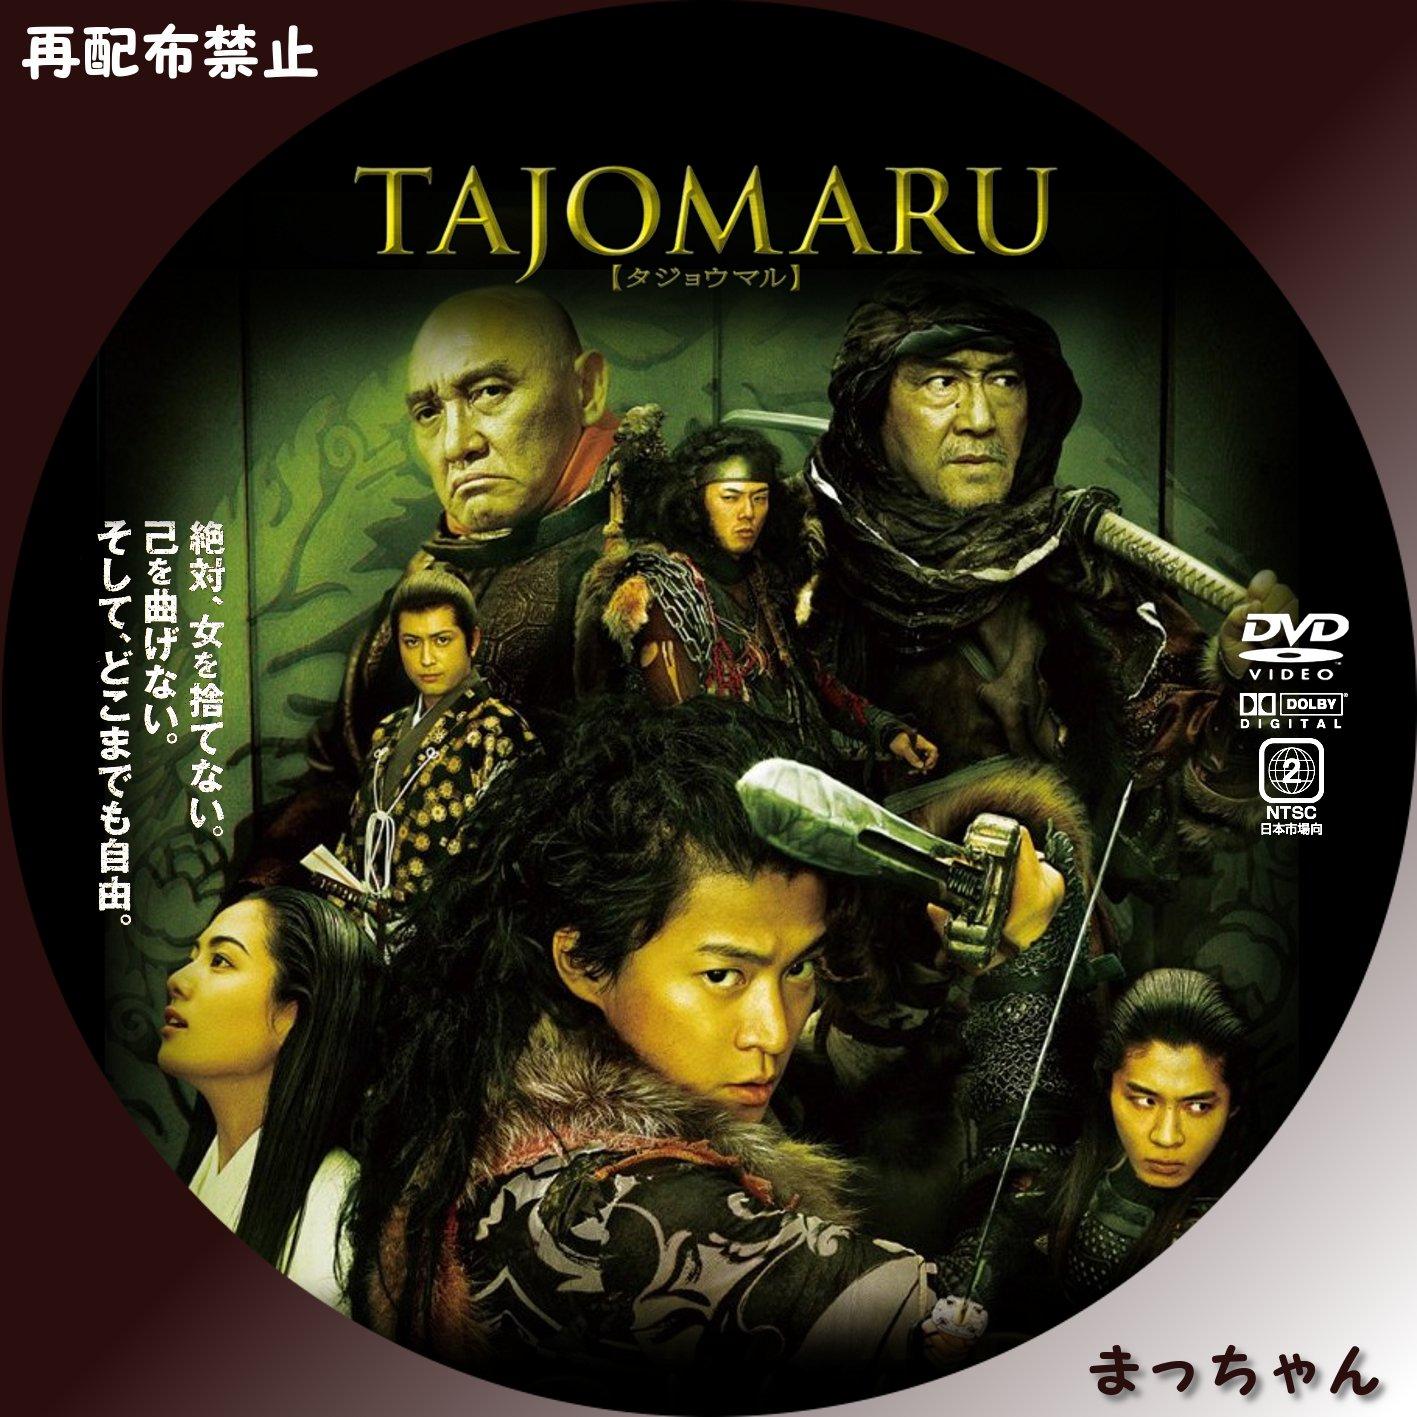 Image Result For Tajomaru